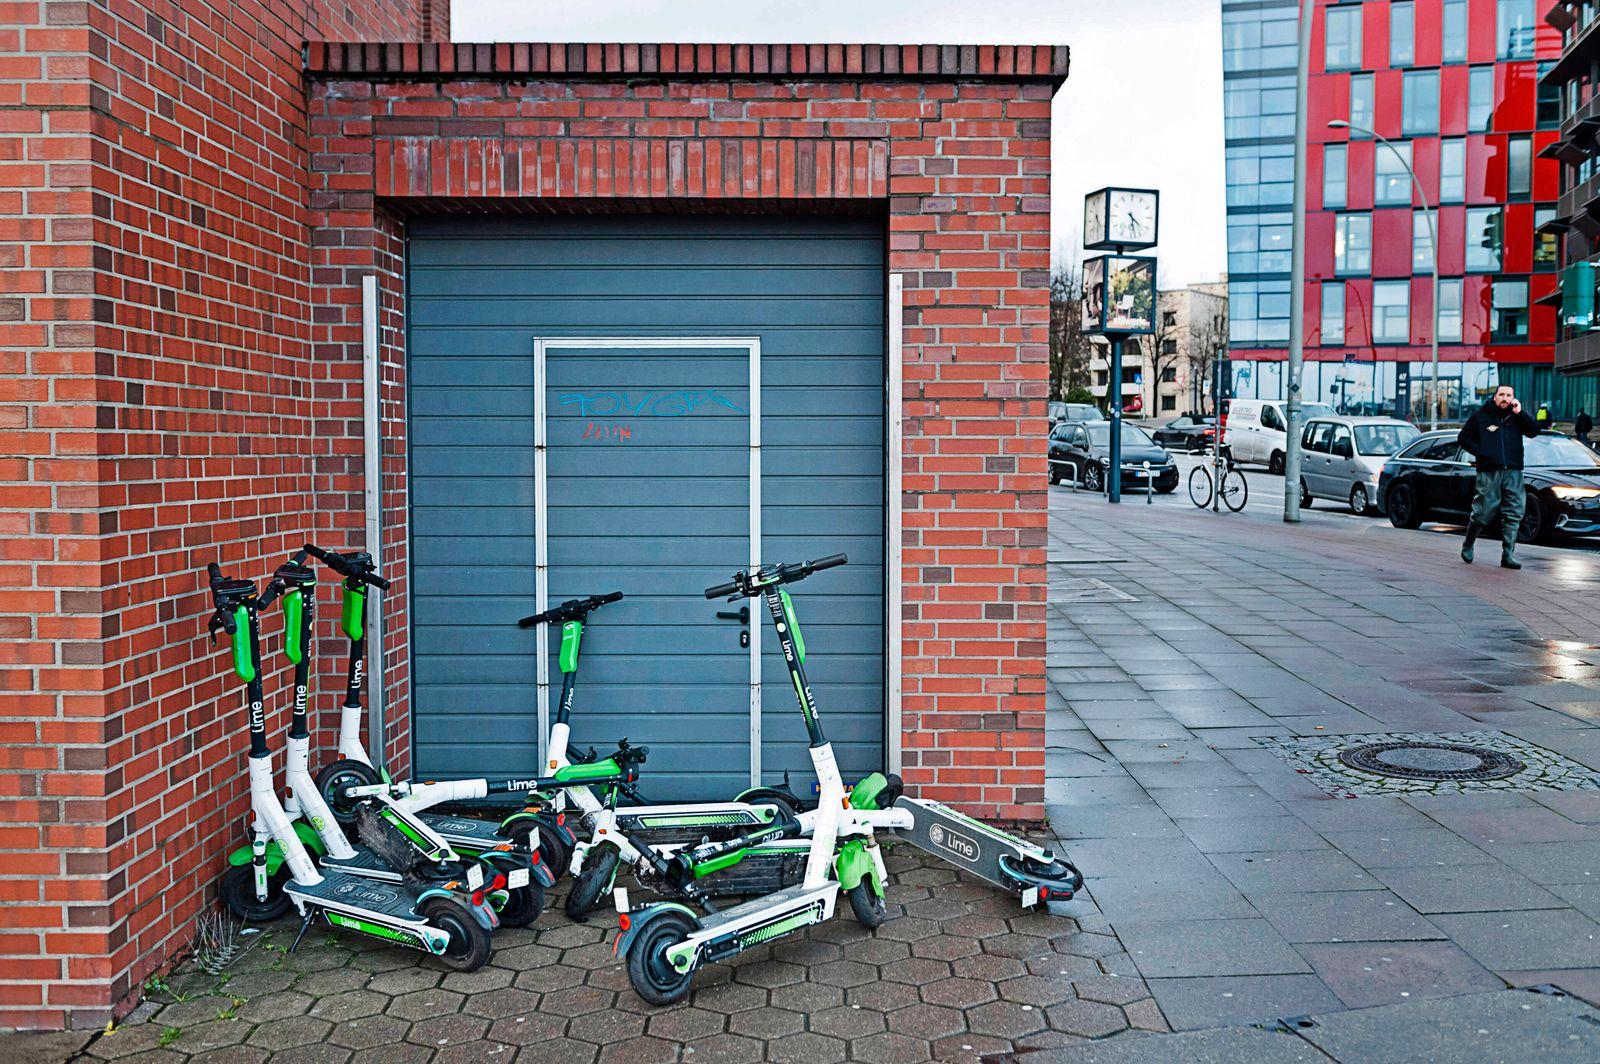 Geparkte E-Scooter abgestellte E-Roller E Roller E Scooter E-Mobil E-Mobilit‰t E-Scooter EScooter Electric-Scooter Elekt